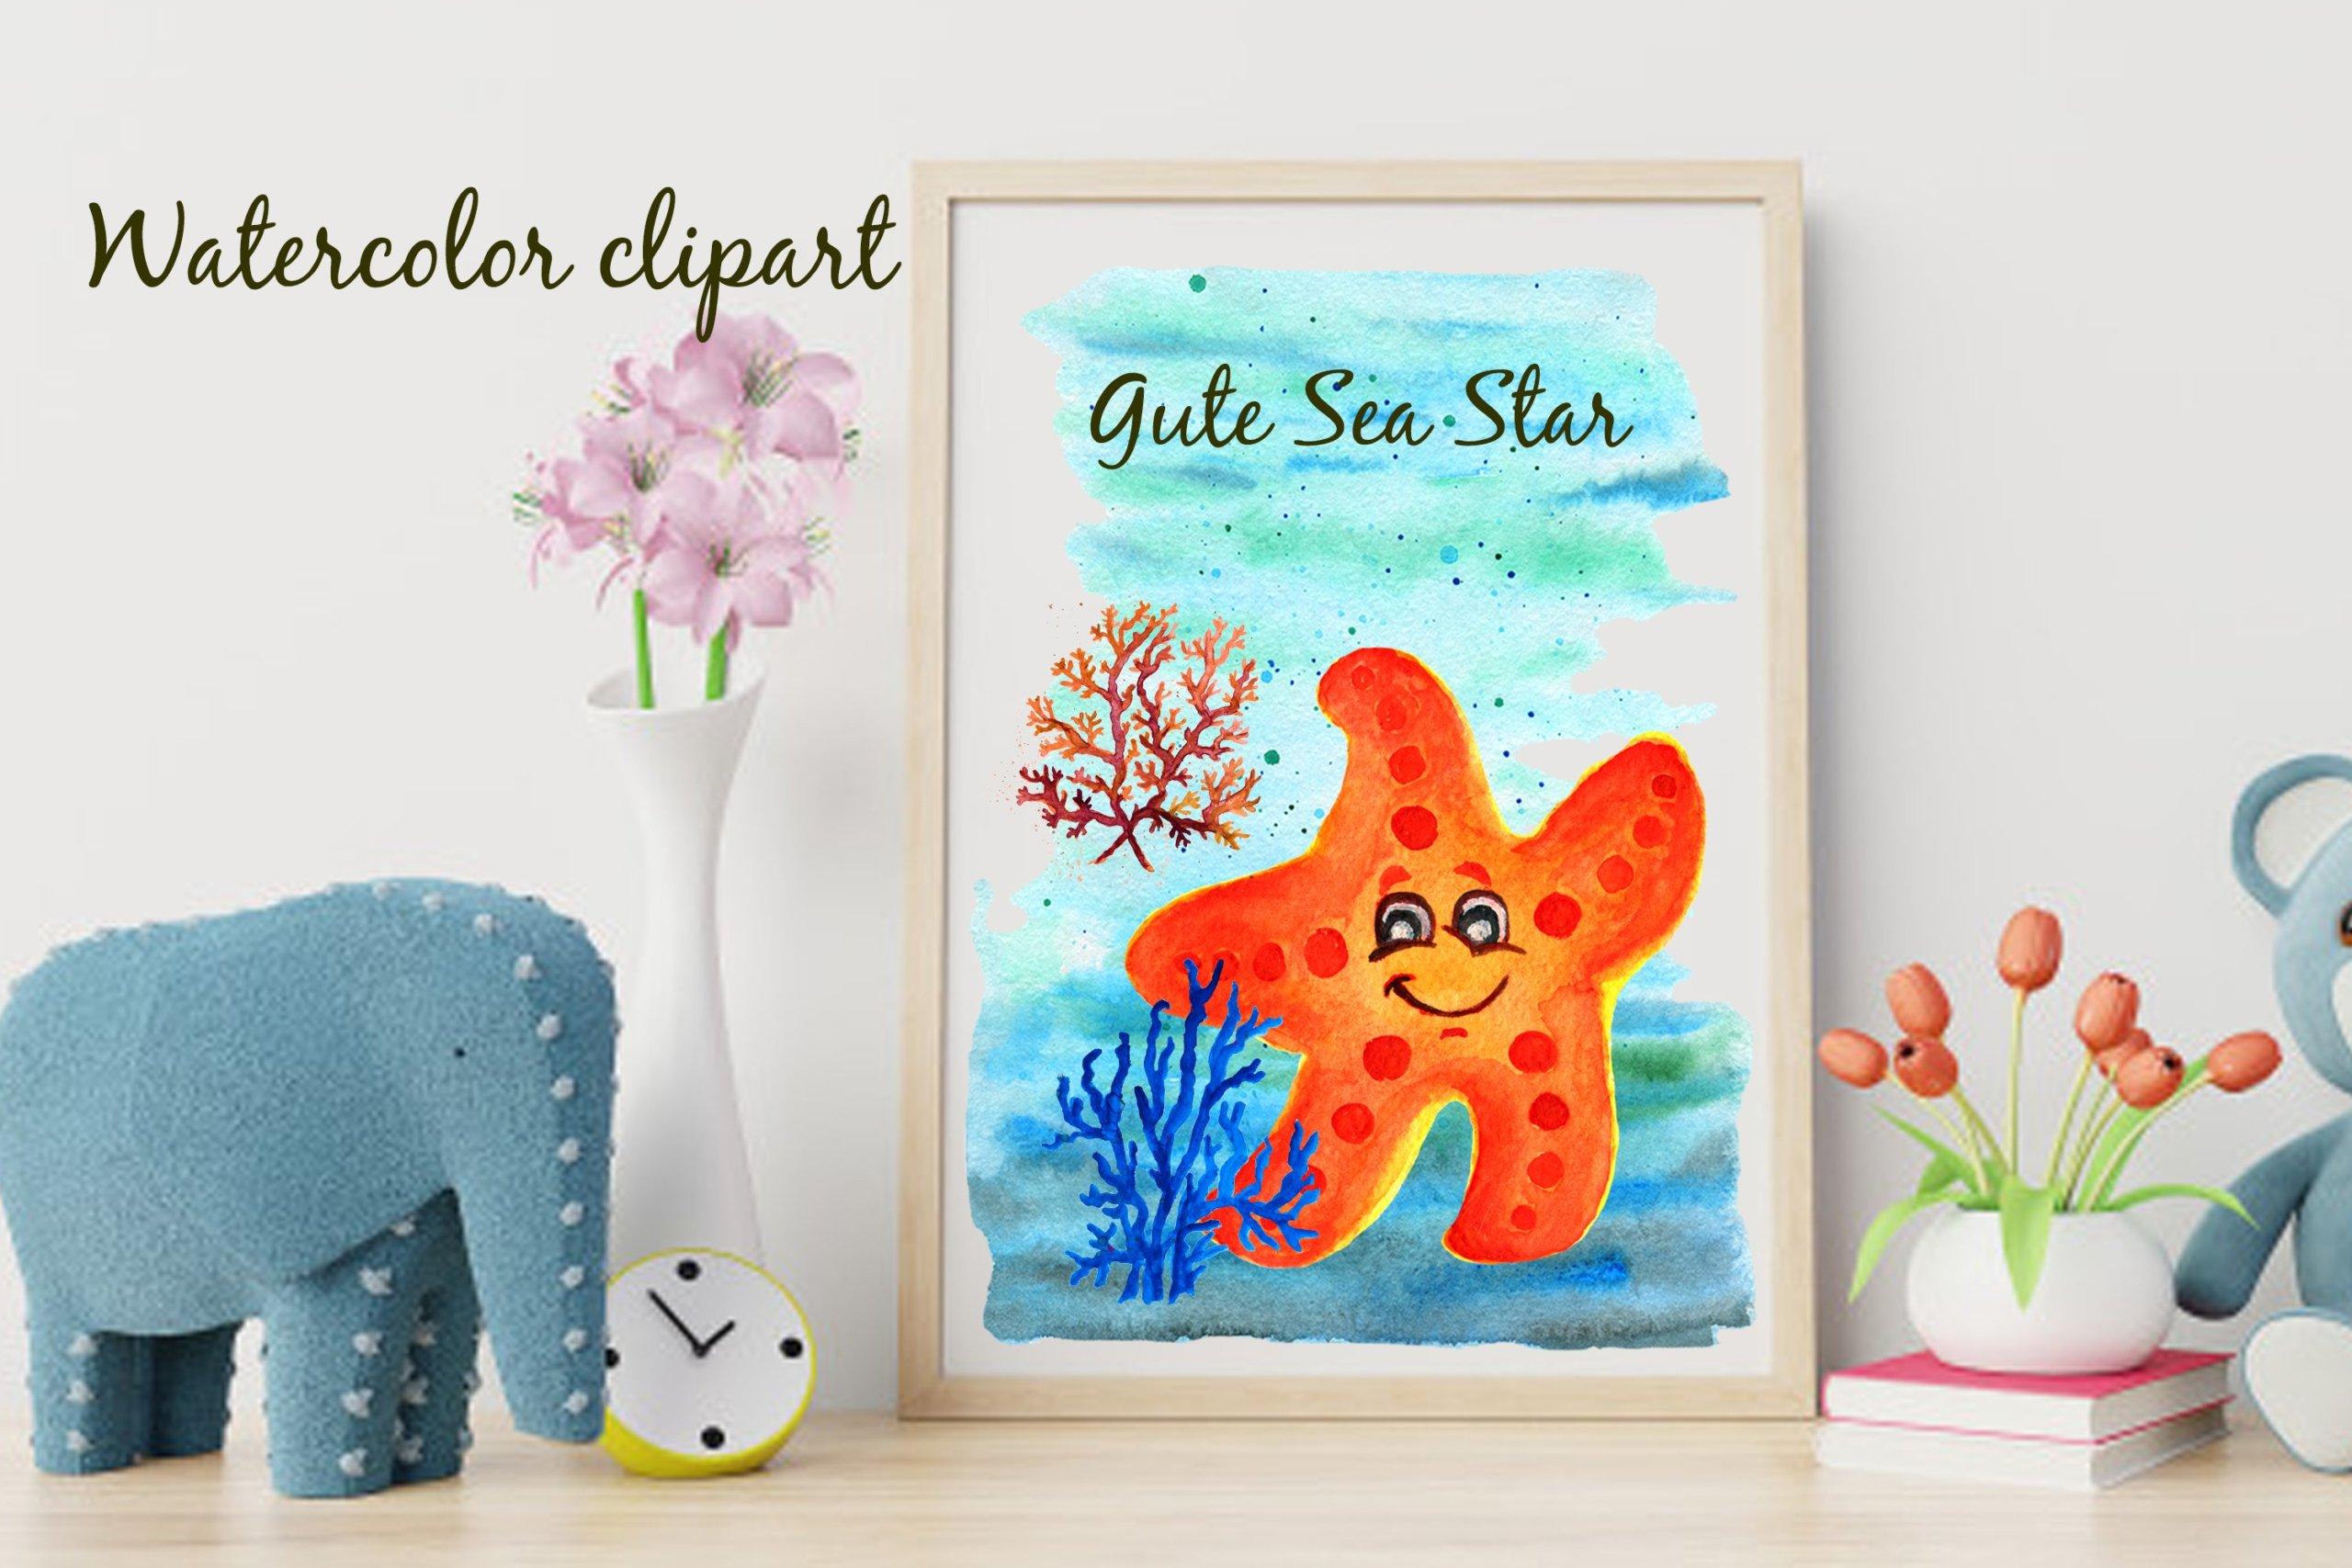 高清海底海星珊瑚手绘剪贴画PNG透明图片素材 Corals Clip Art for Kids Watercolor Sea插图5